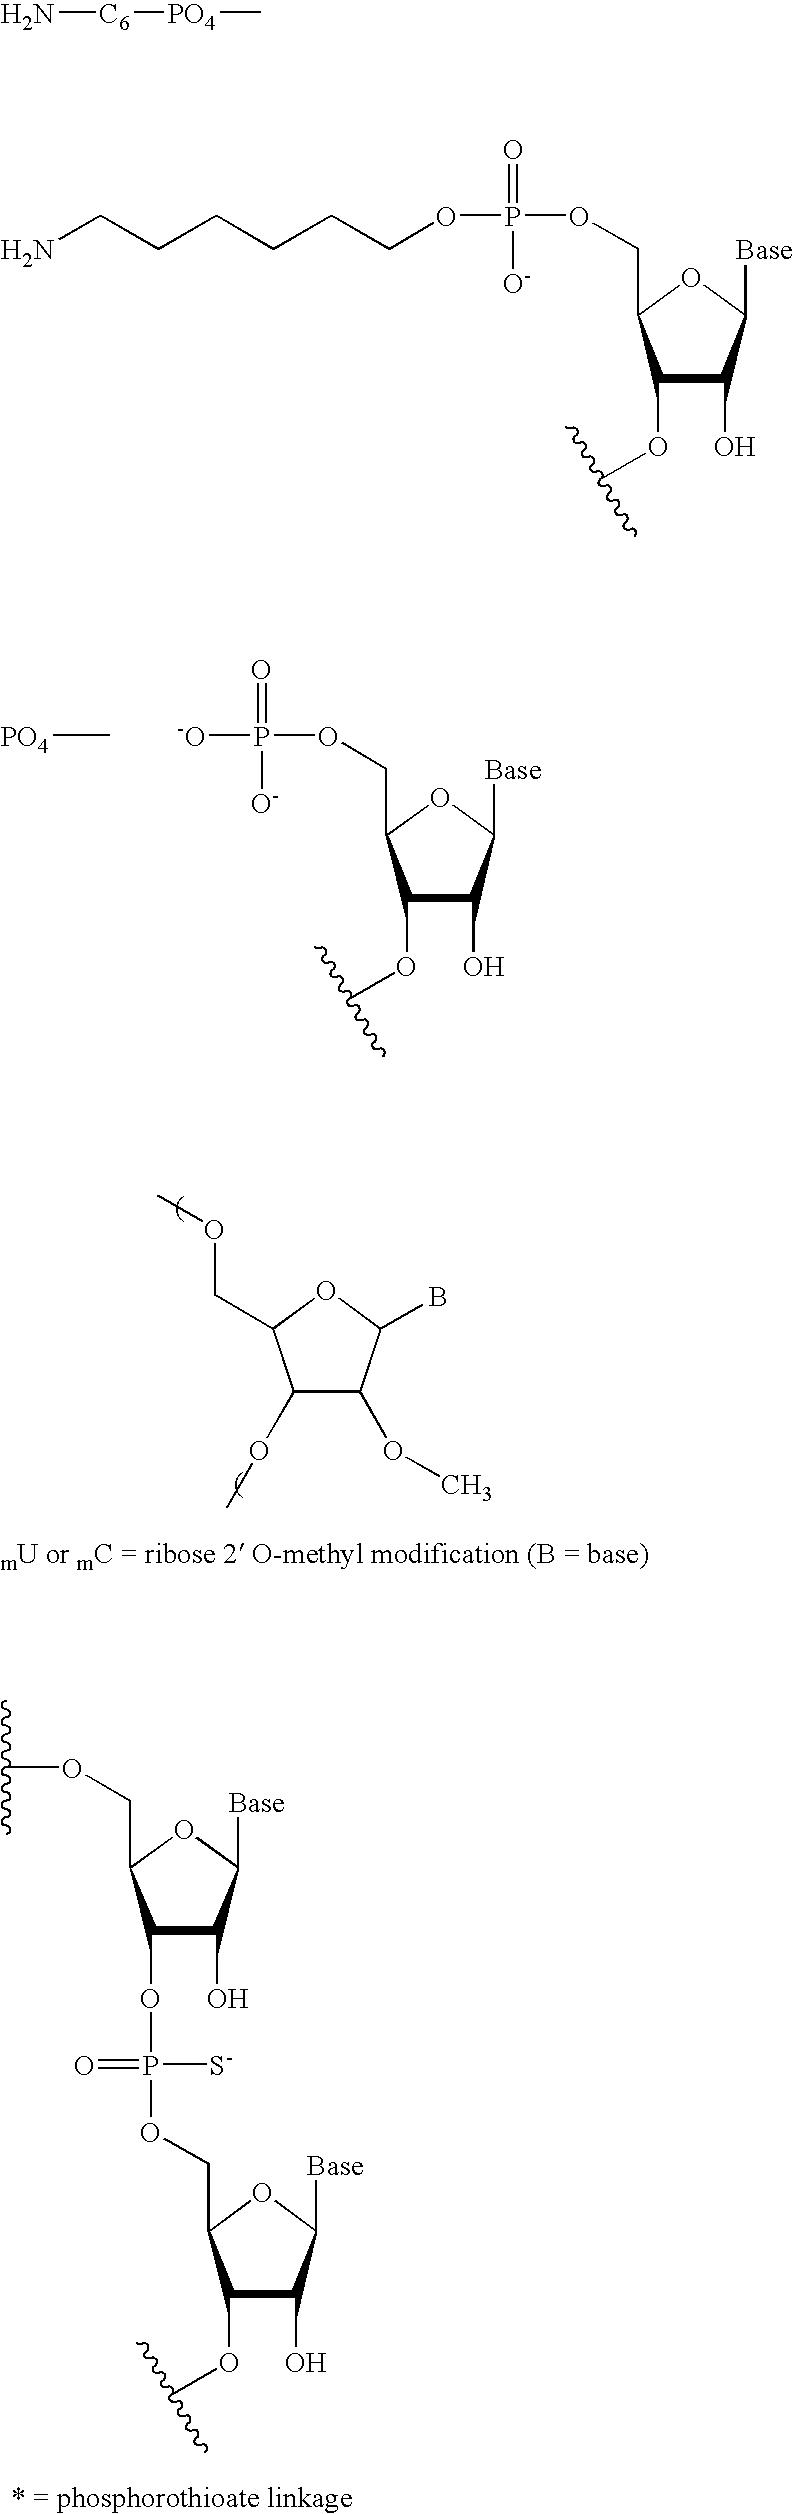 53c395fda3b08a US8008355B2 - Endosomolytic poly(vinyl ether) polymers - Google Patents